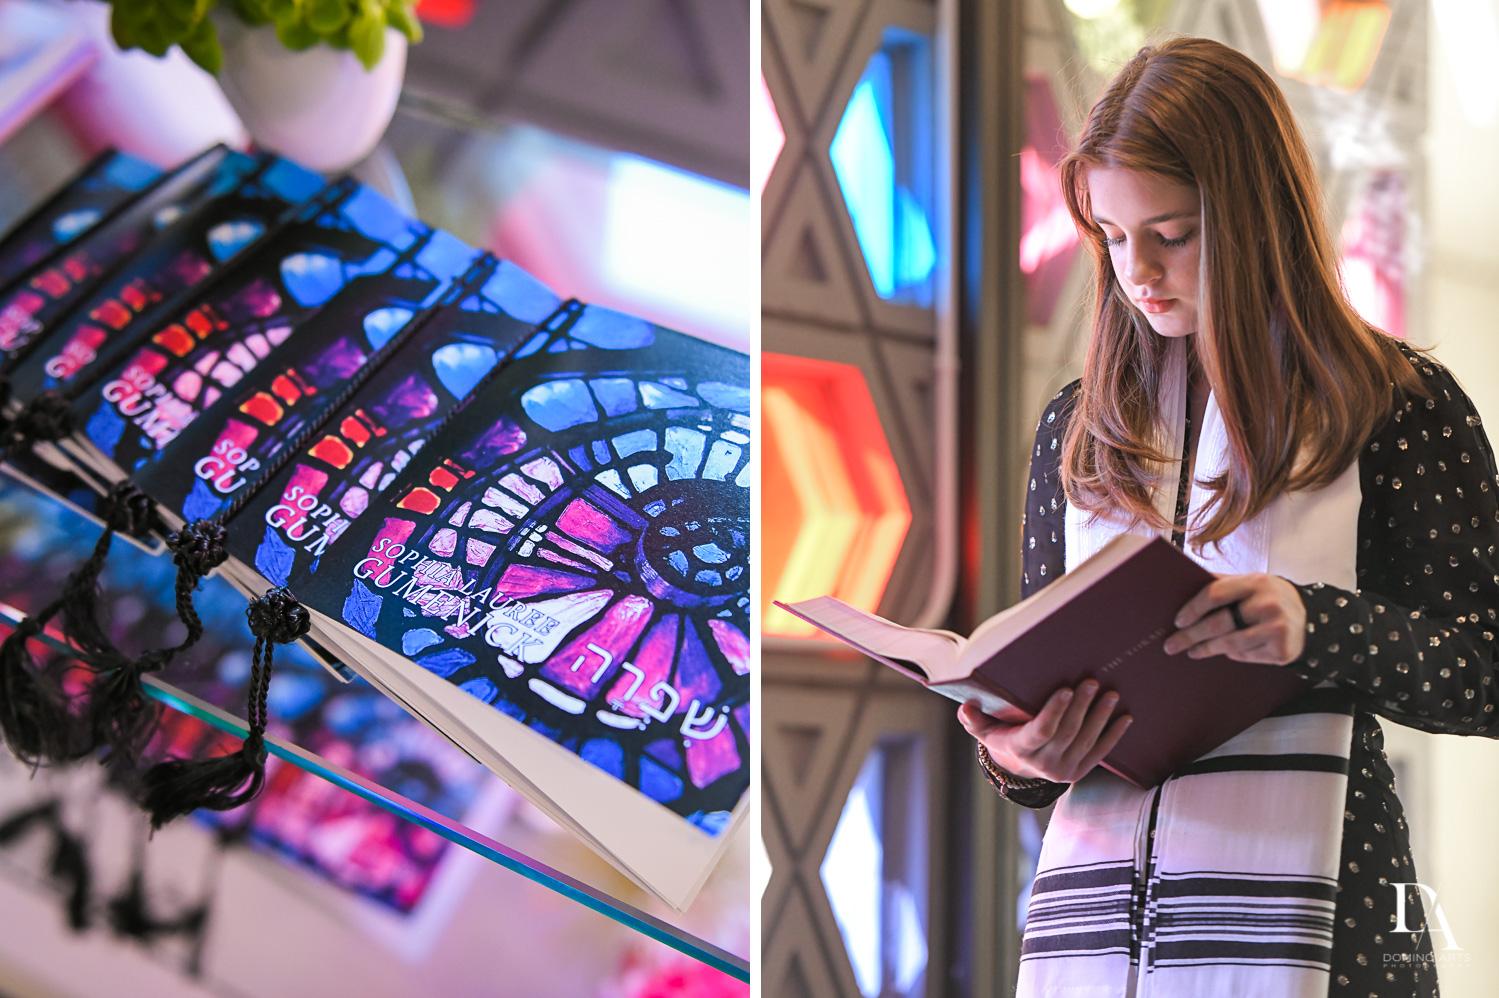 natural light at Music Festival Bat Mitzvah at The Fillmore Miami Beach by Domino Arts Photography